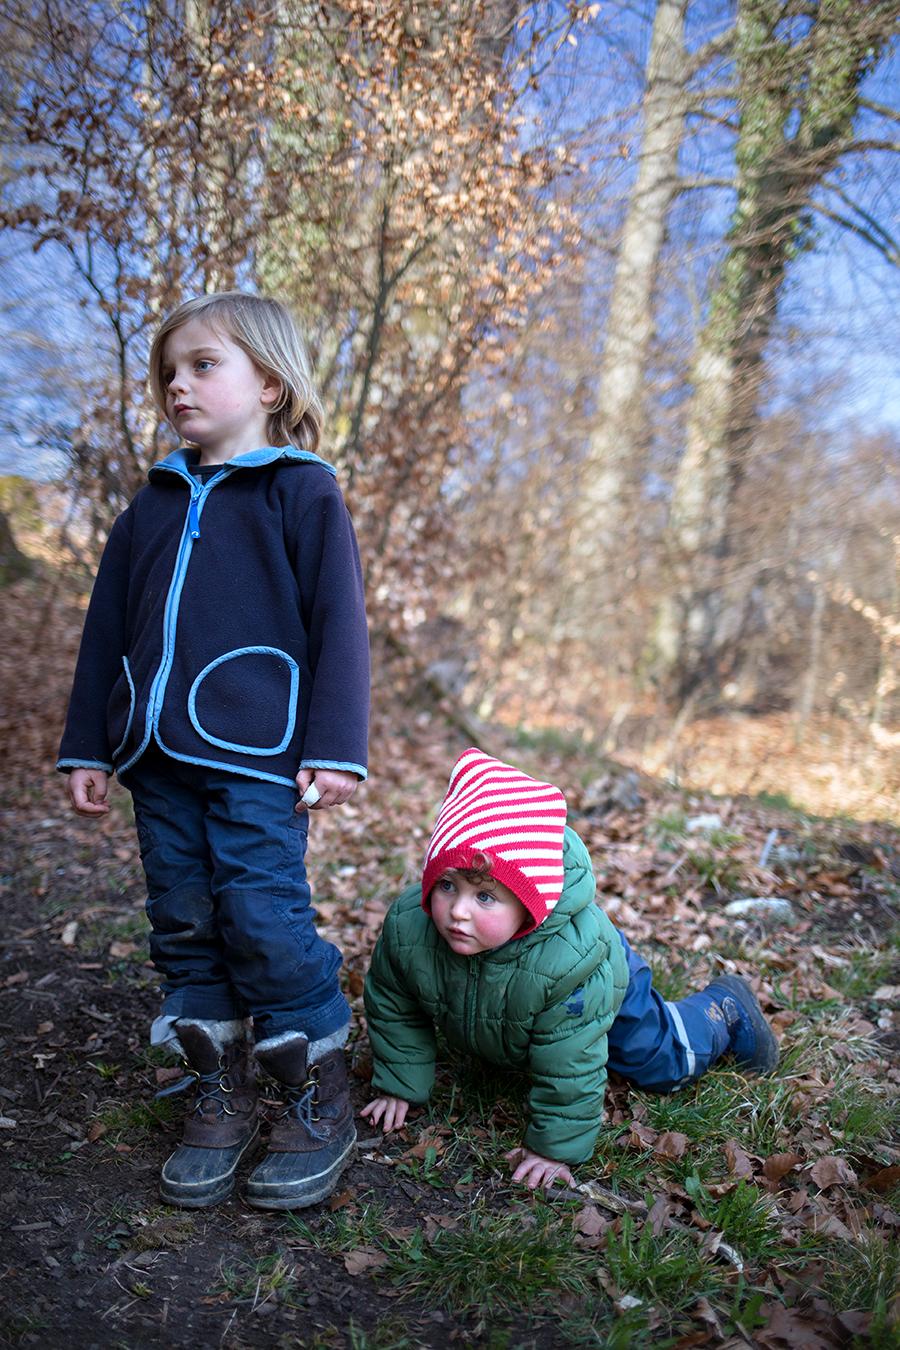 Familienfotografie Stuttgart, Familienfotografie Baden-Württemberg, Familienfotografie Deutschland